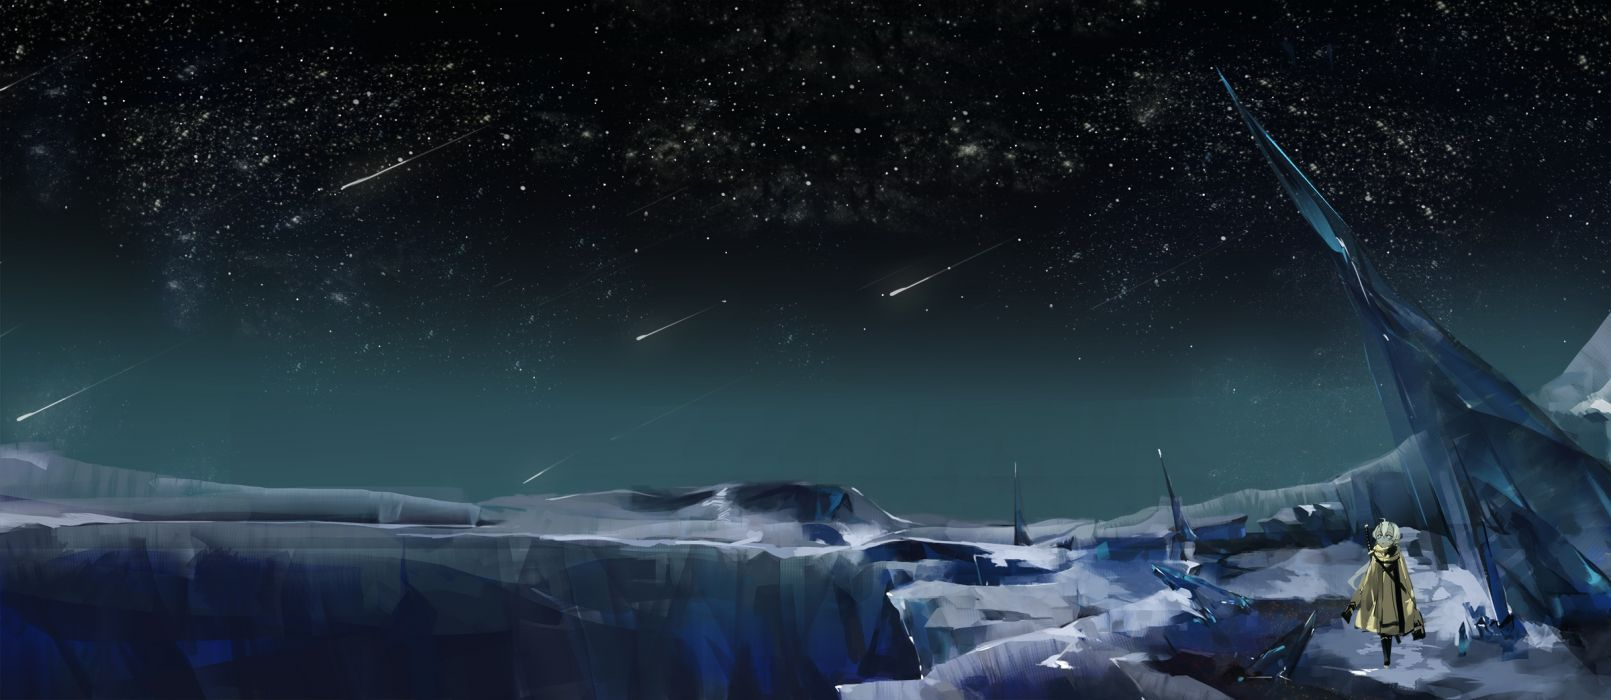 night pixiv fantasia saberiii scenic sky stars wallpaper